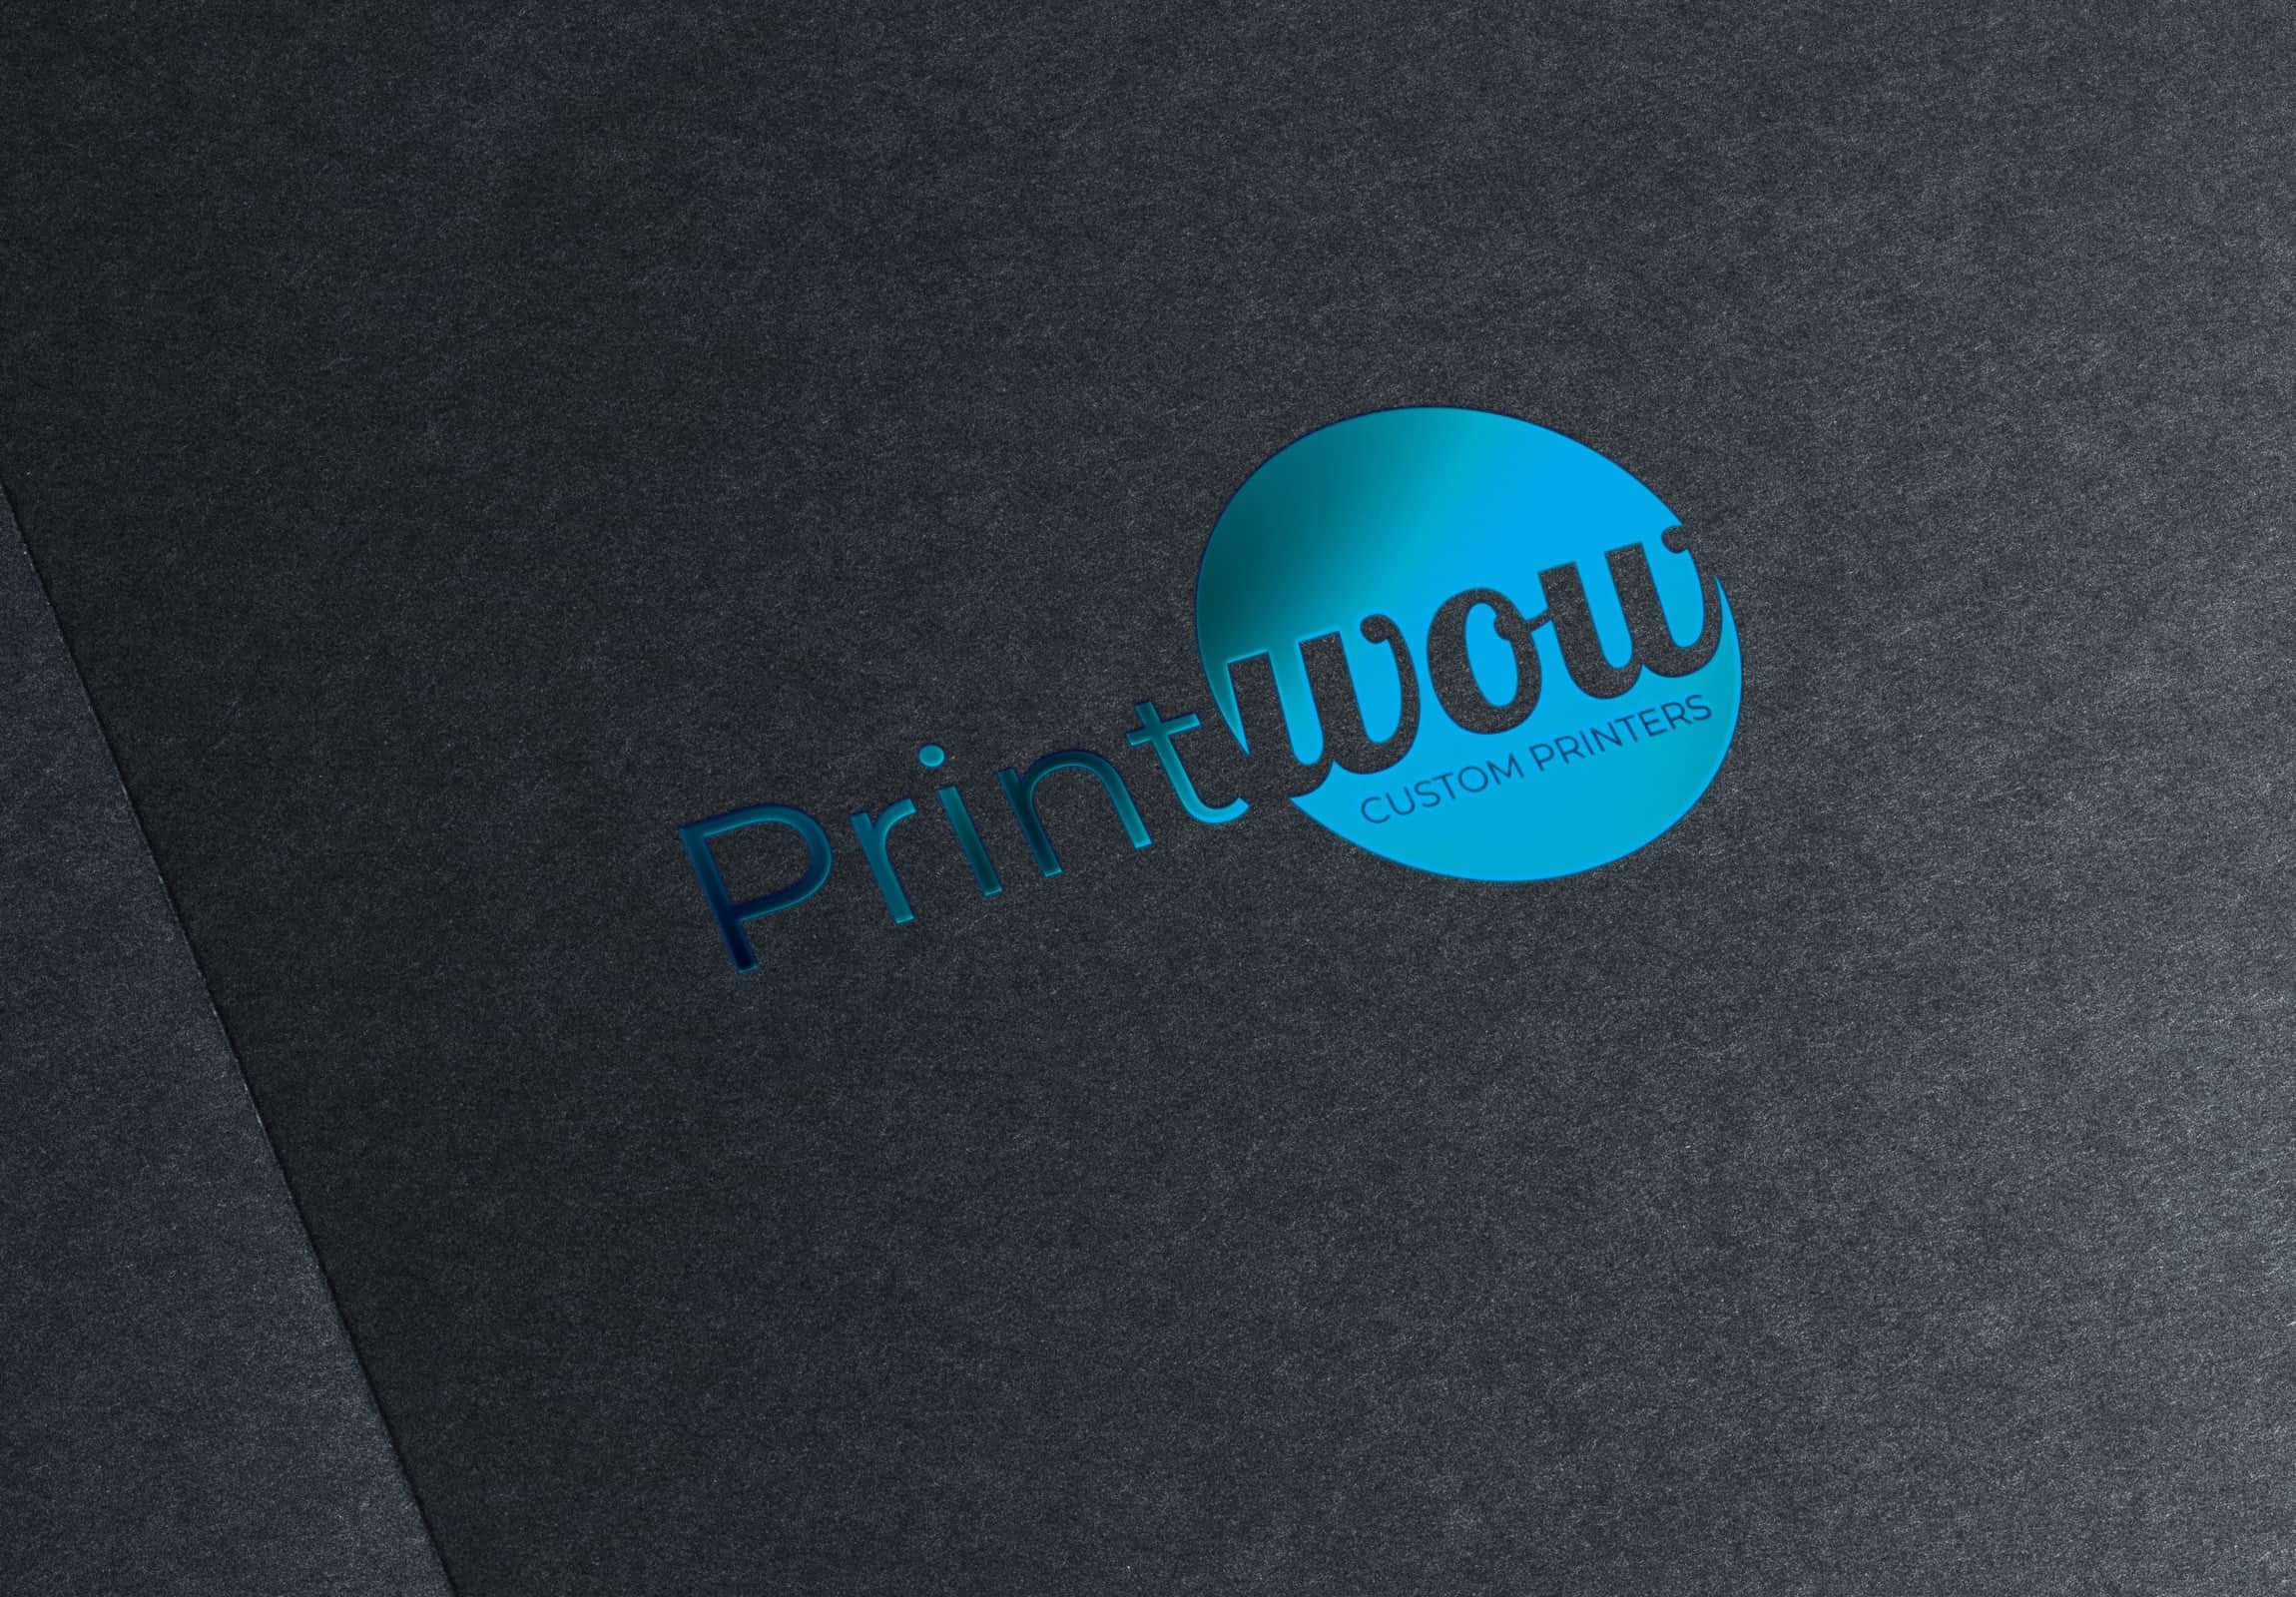 printwow_businesscardmetallic